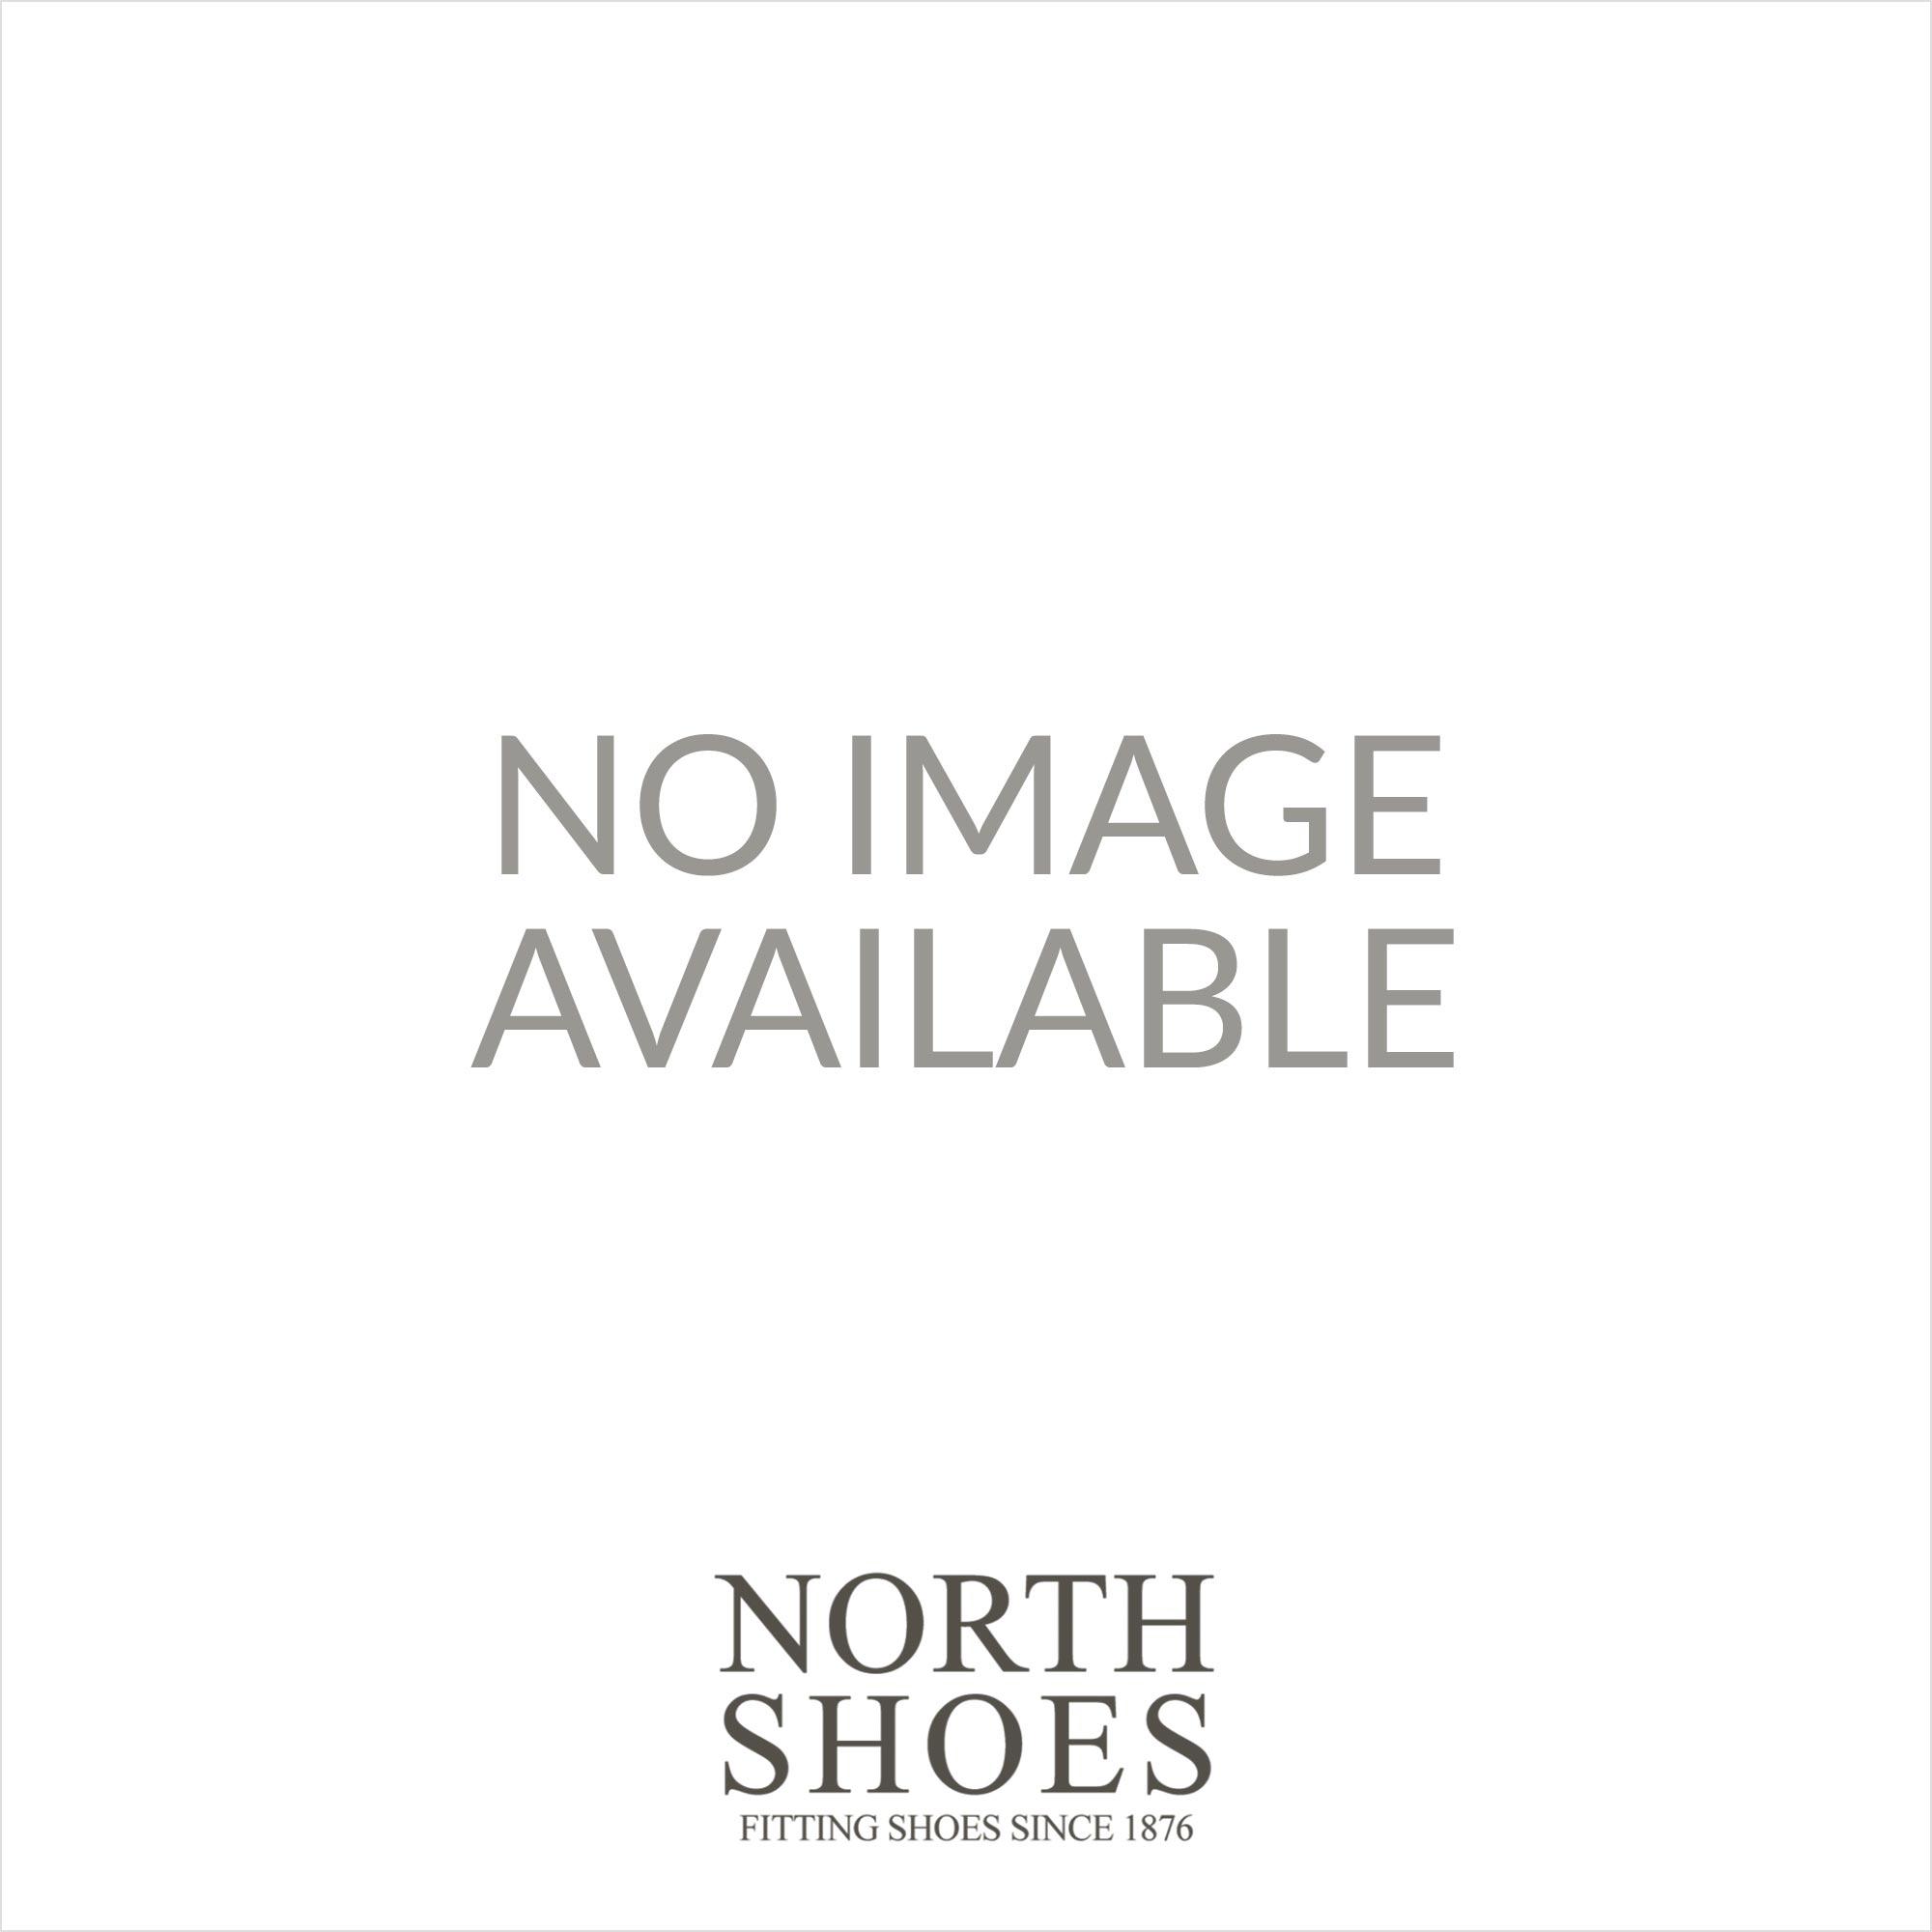 9b163aa78a30 Rieker 62436-14 Navy Womens Pull On Wedge Heeled Sandal - Rieker ...